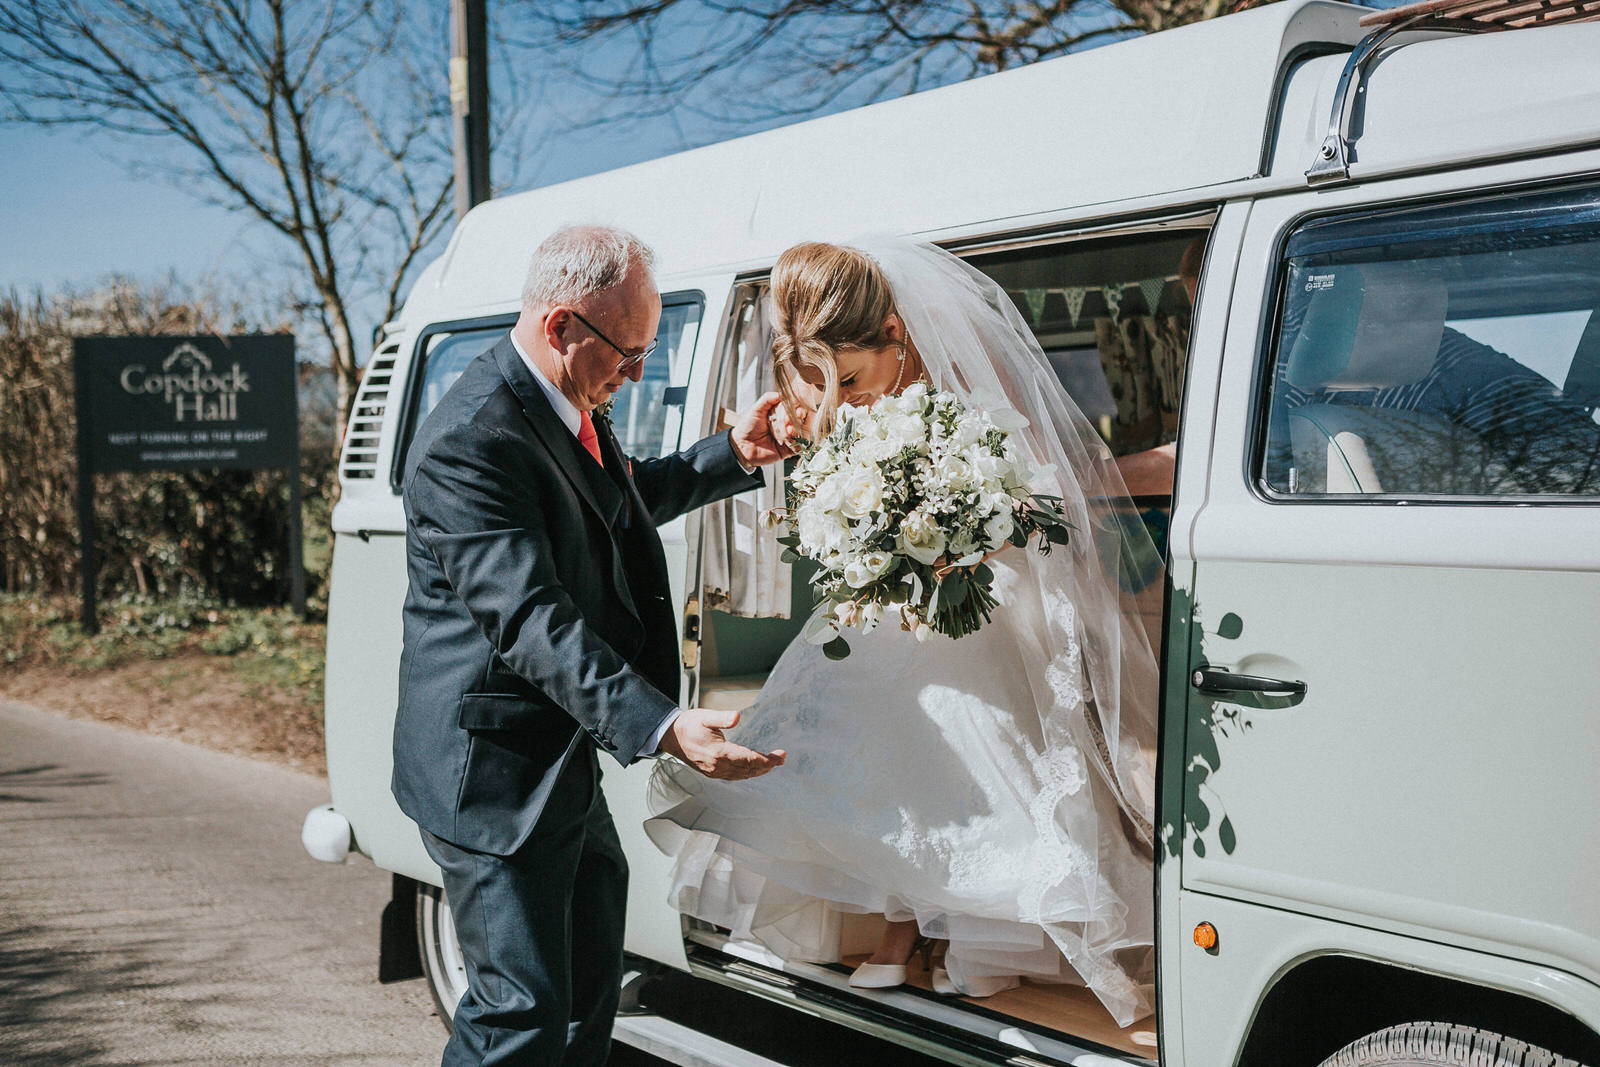 Copdock Hall Wedding Photography - 29.jpg